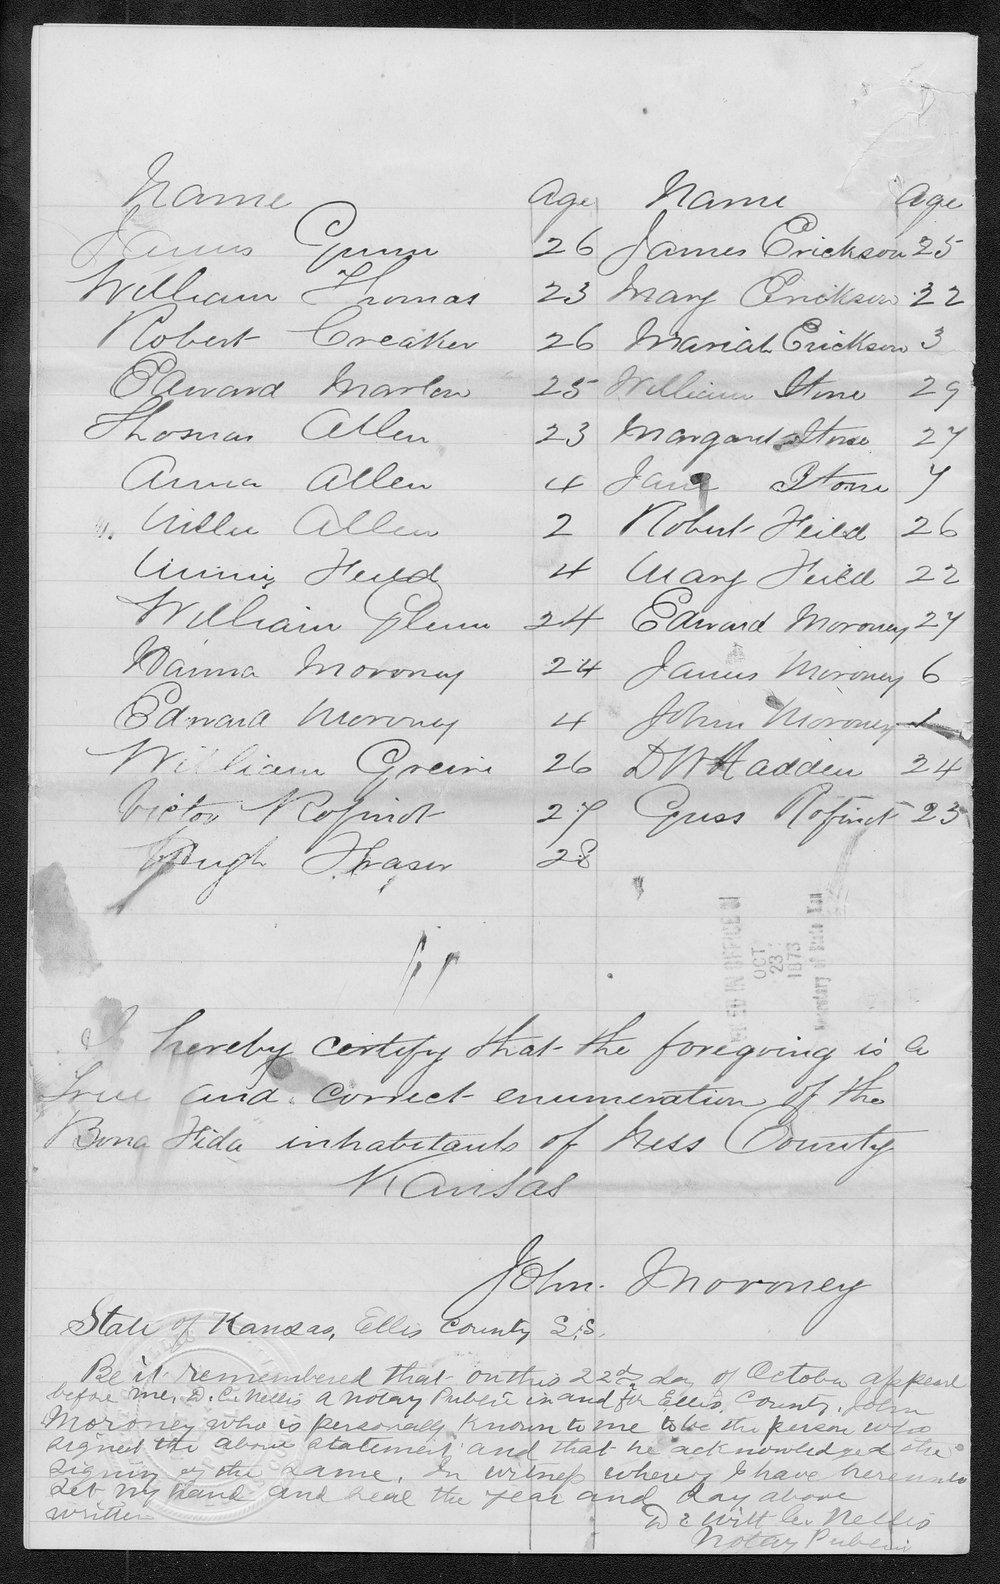 Ness County organization records - 12